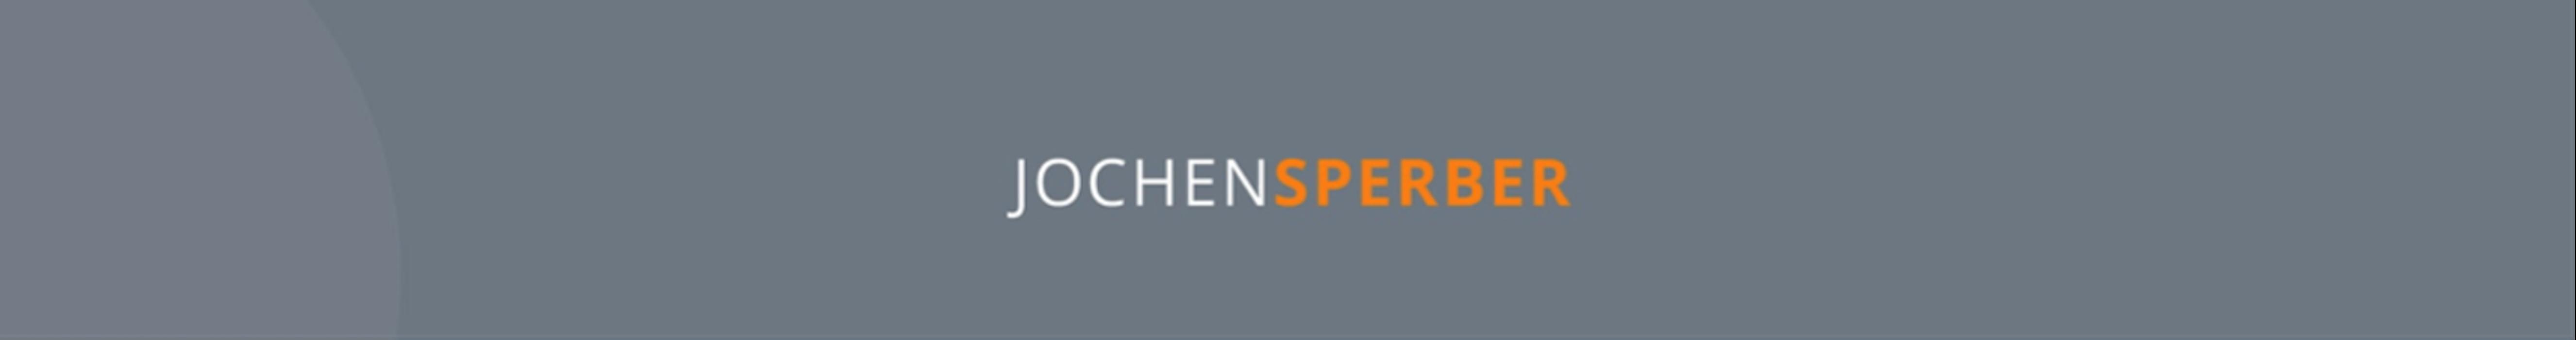 Bild zu Jochen Sperber - SPEAKER - in Düsseldorf